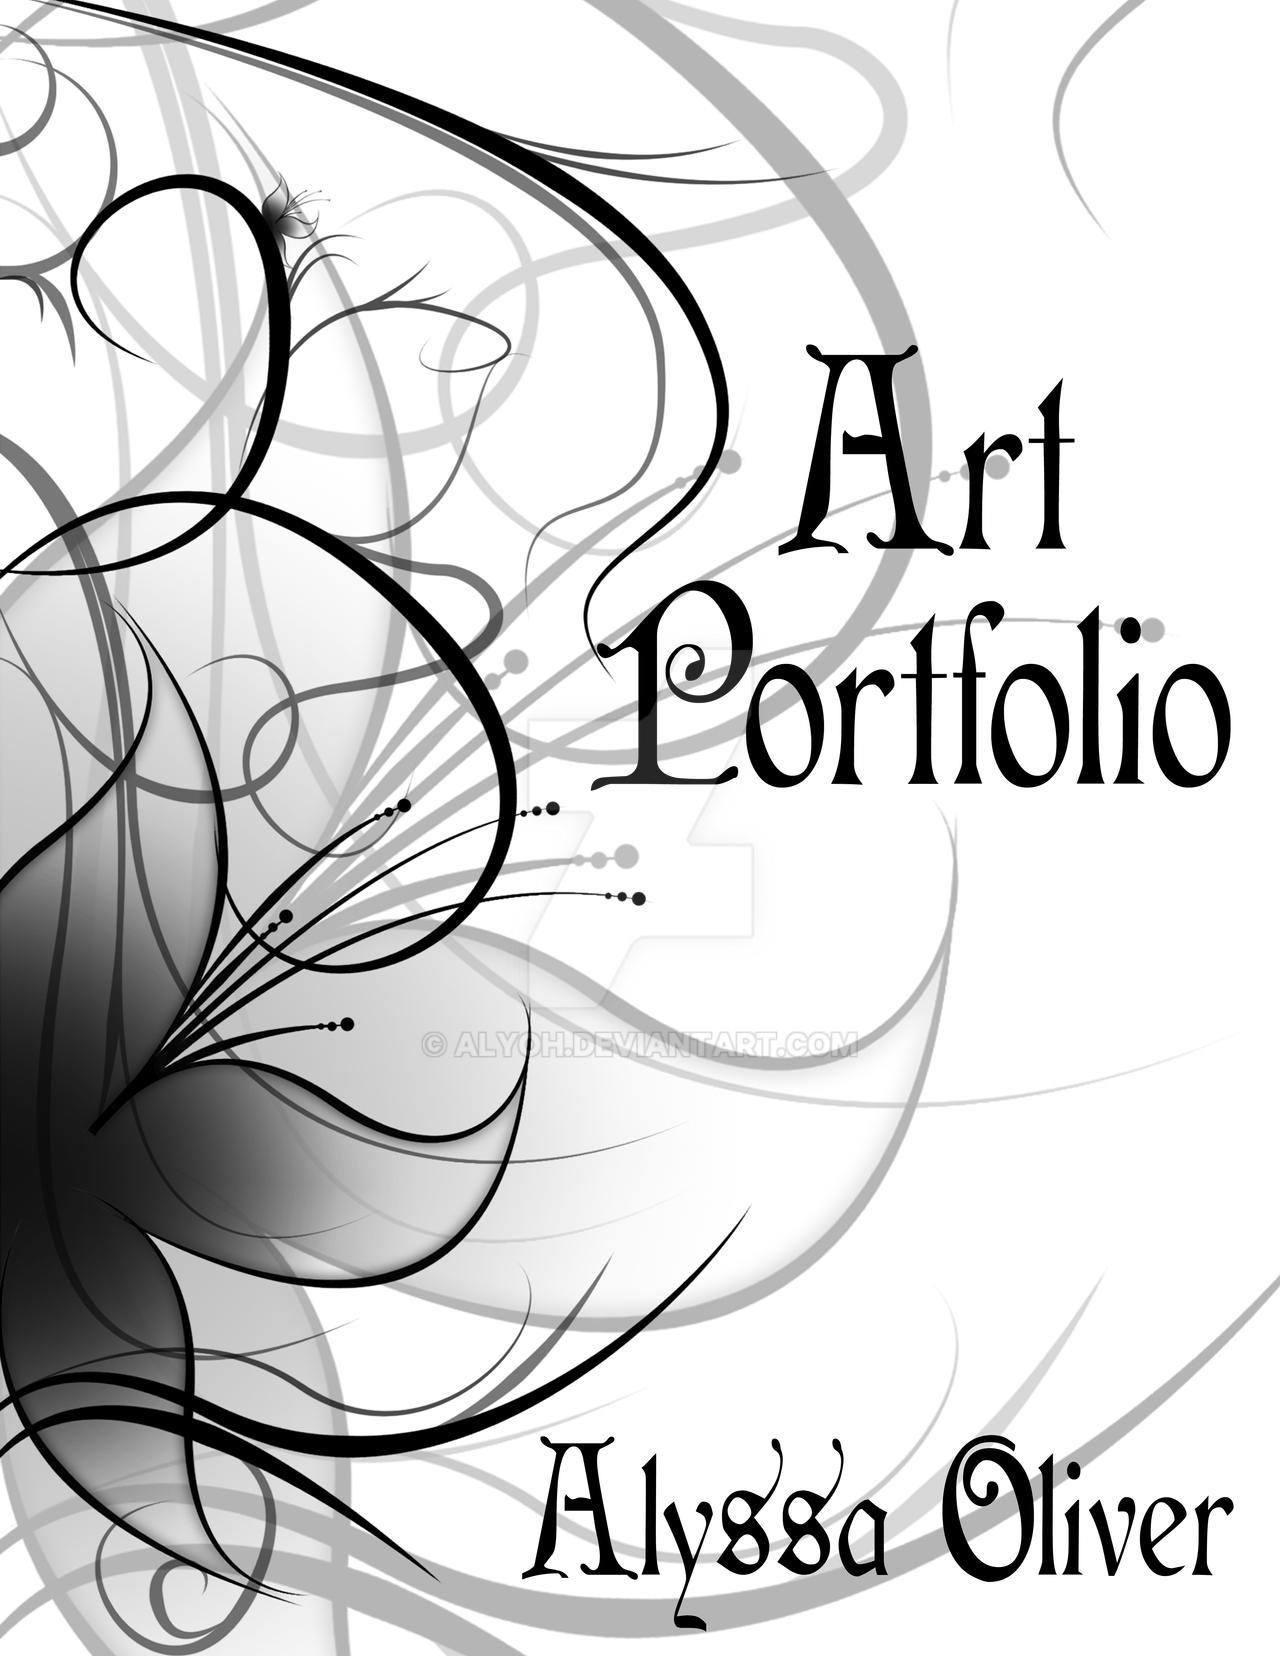 my vase portfolio coverpage by alyoh on deviantart Glatthaar Chalk Art my vase portfolio coverpage by alyoh my vase portfolio coverpage by alyoh